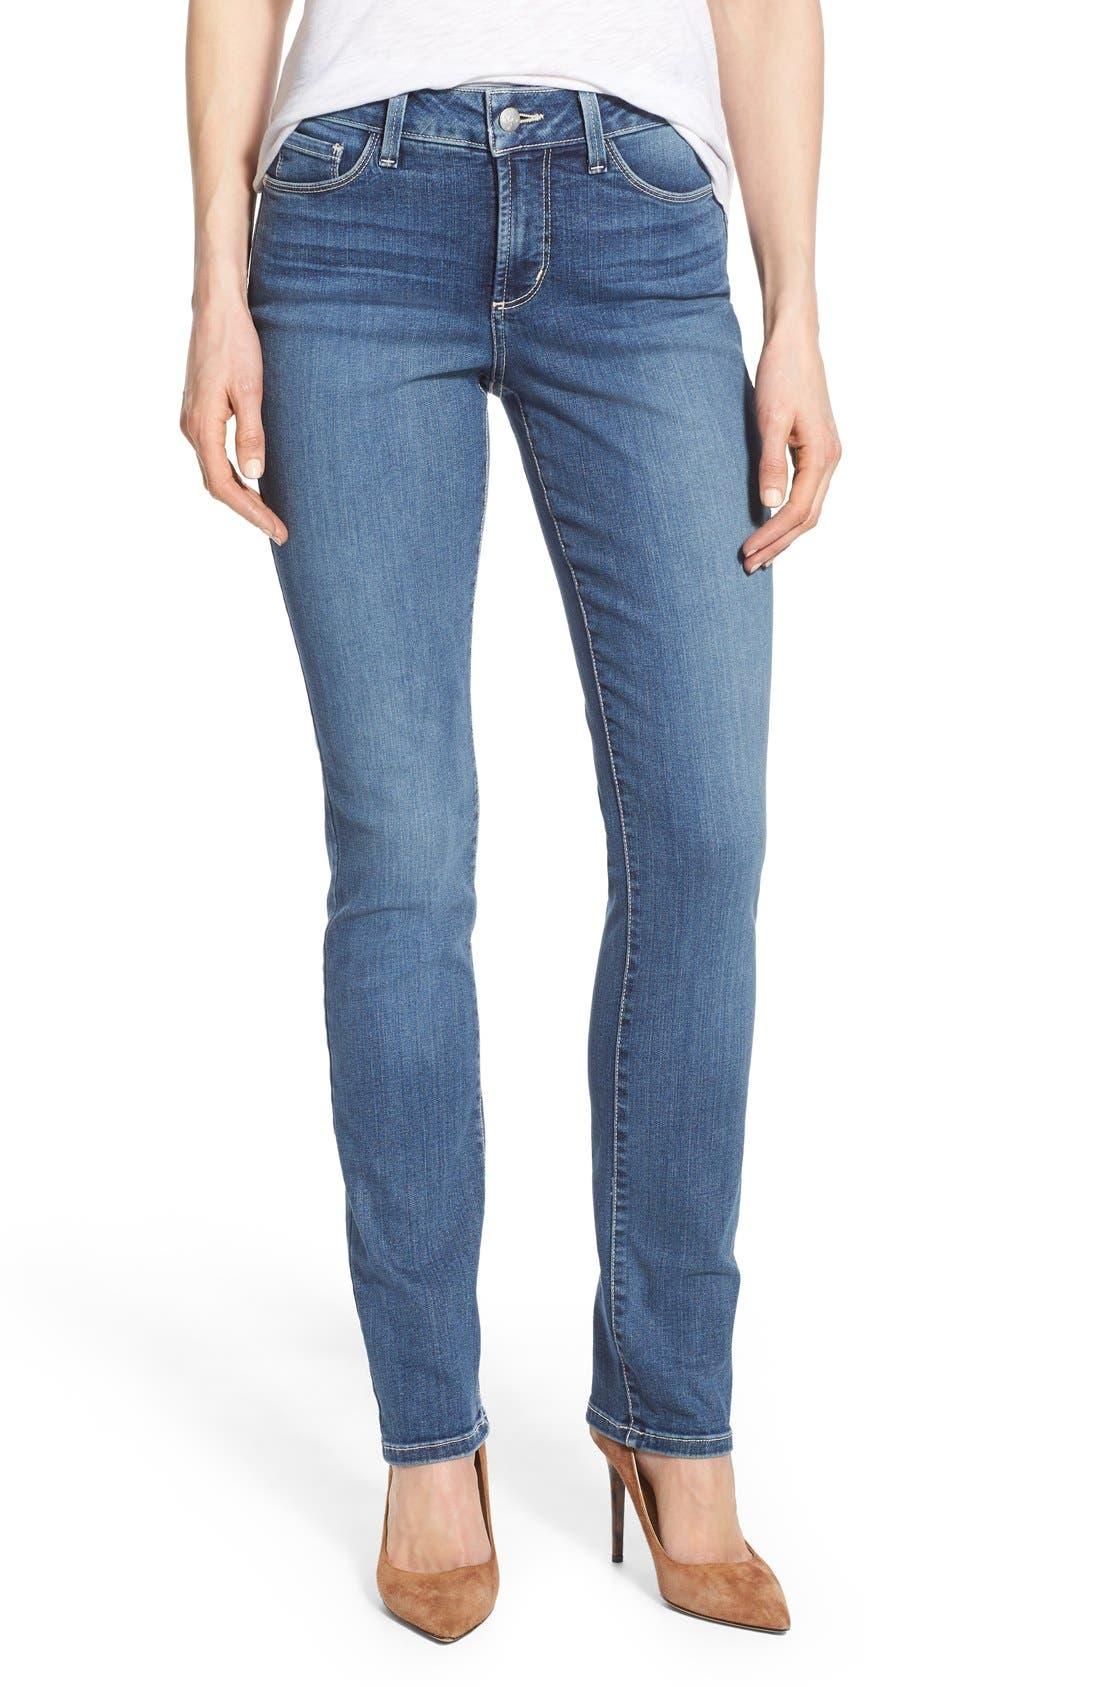 'Samantha' Stretch Slim Straight Leg Jeans,                             Main thumbnail 1, color,                             421